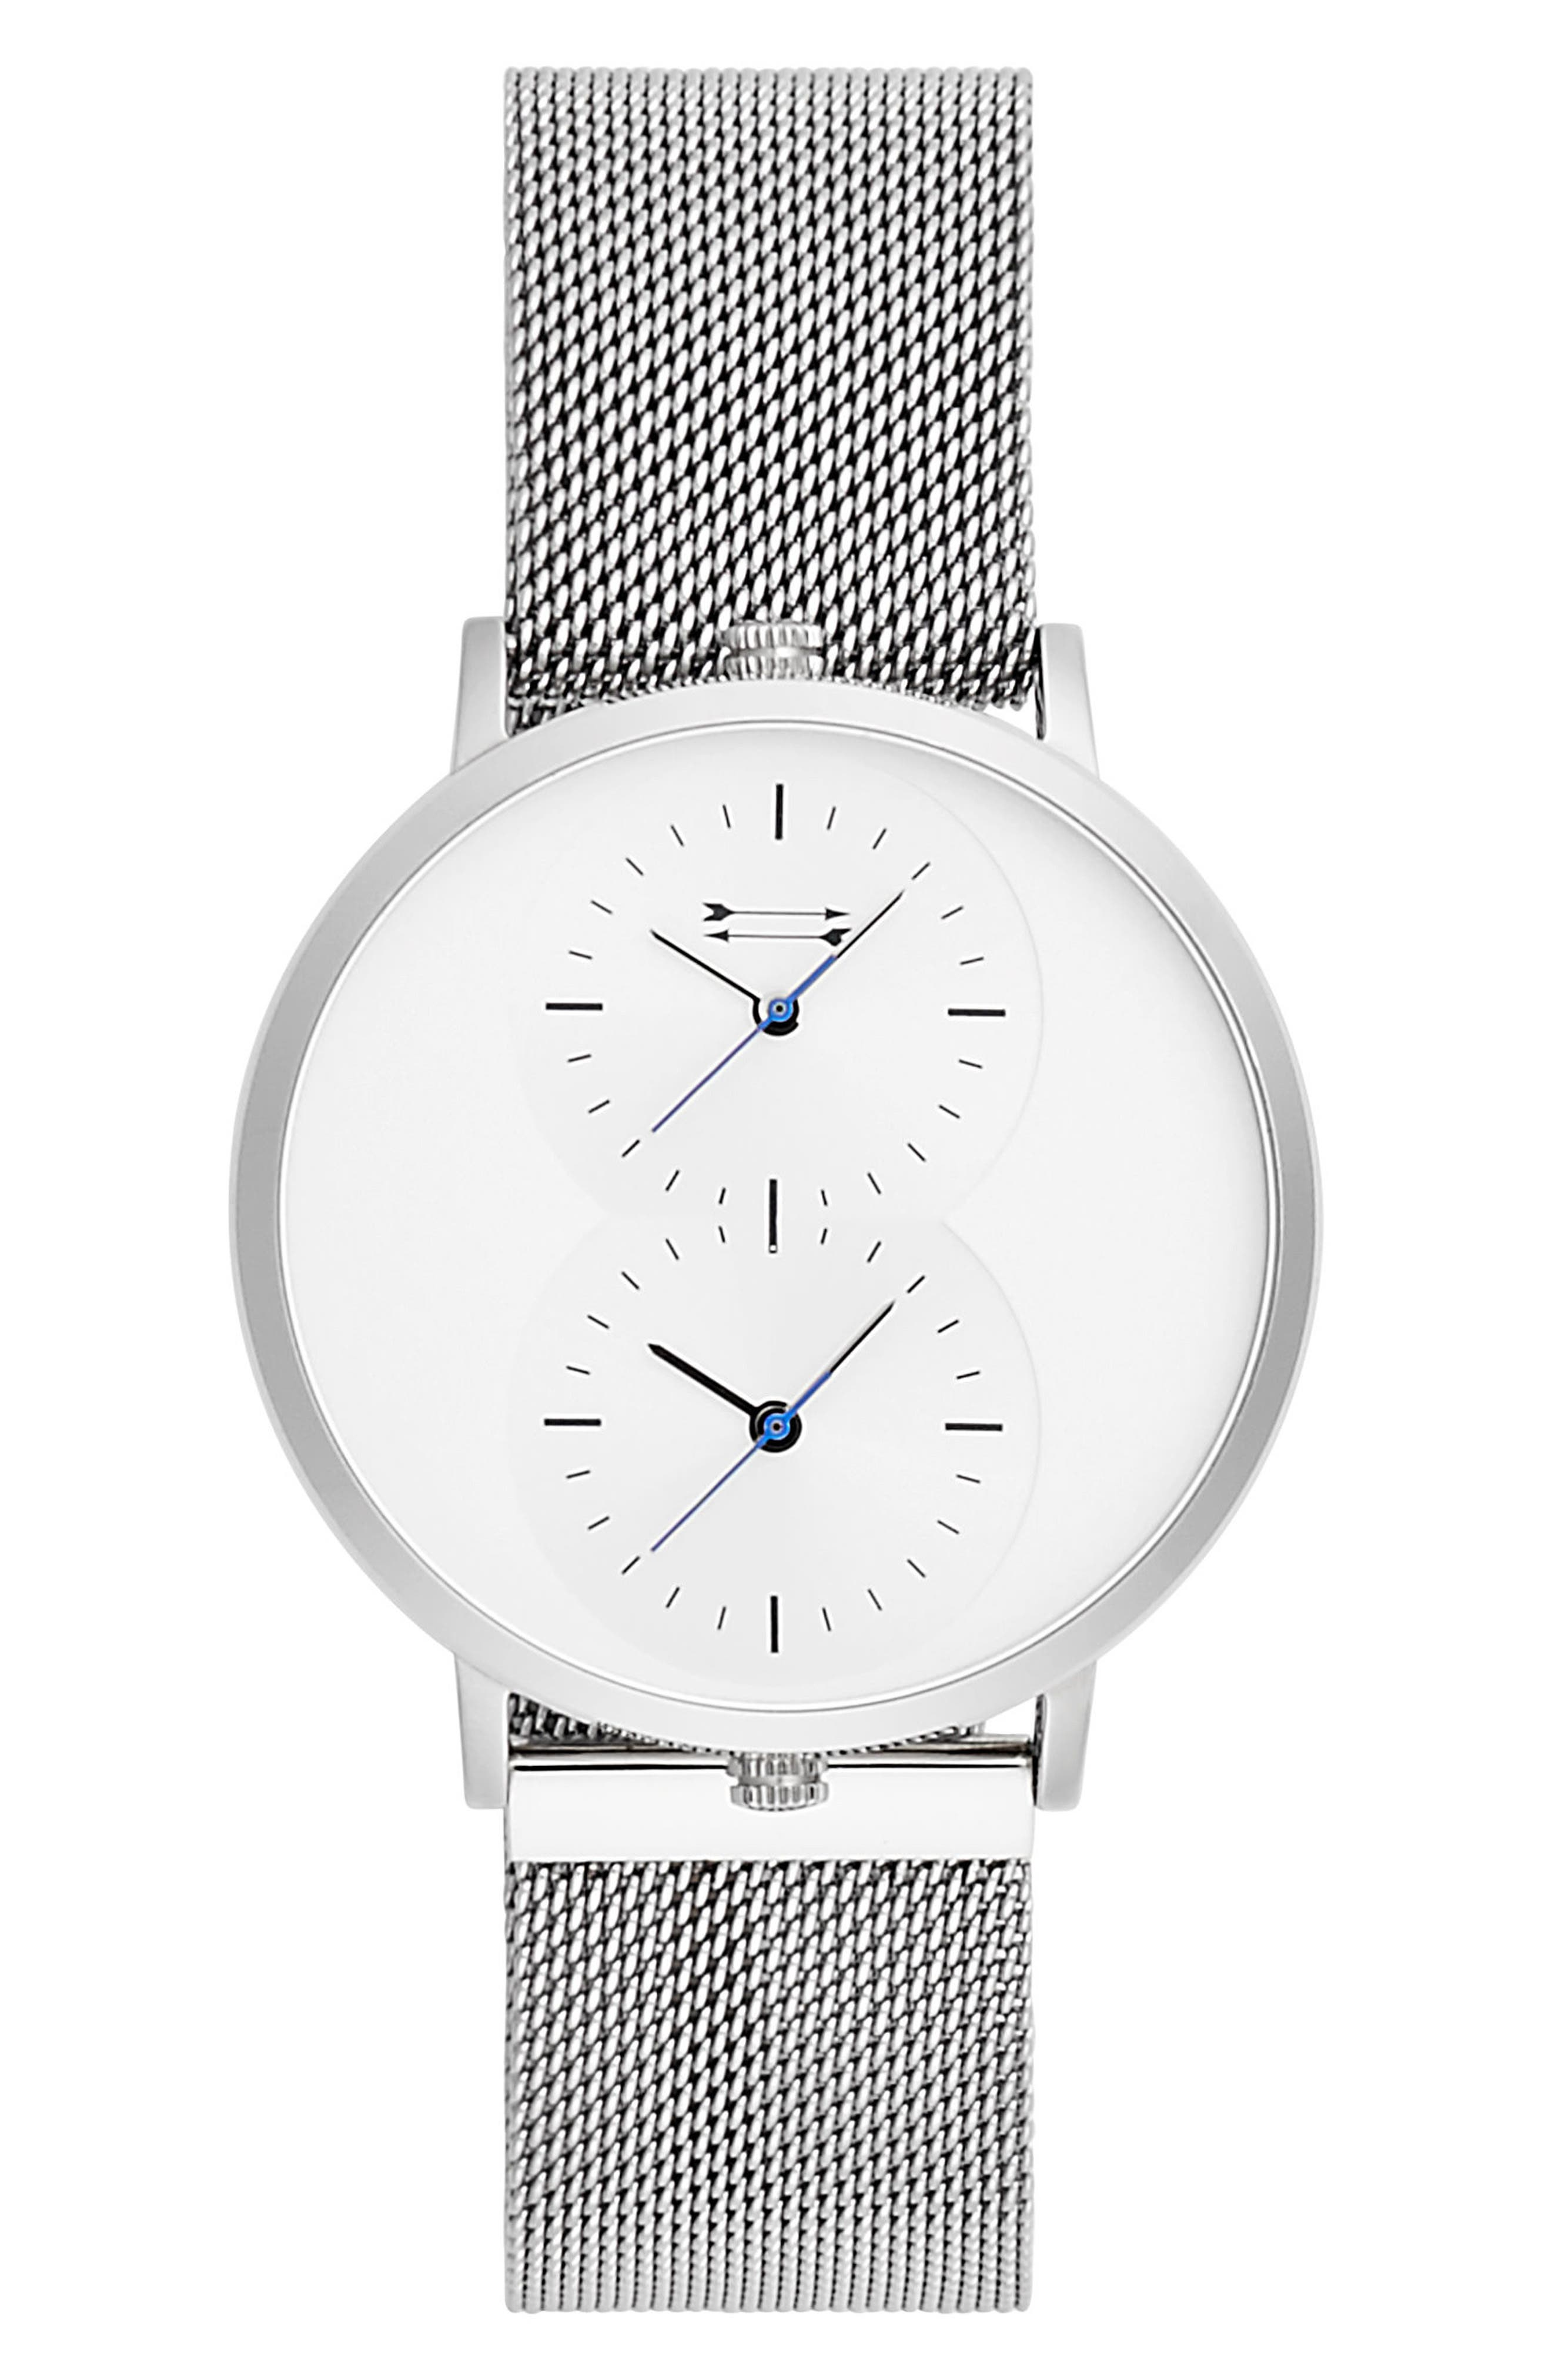 URI MINKOFF Griffith Mesh Strap Watch, 43Mm in Silver/ White/ Silver